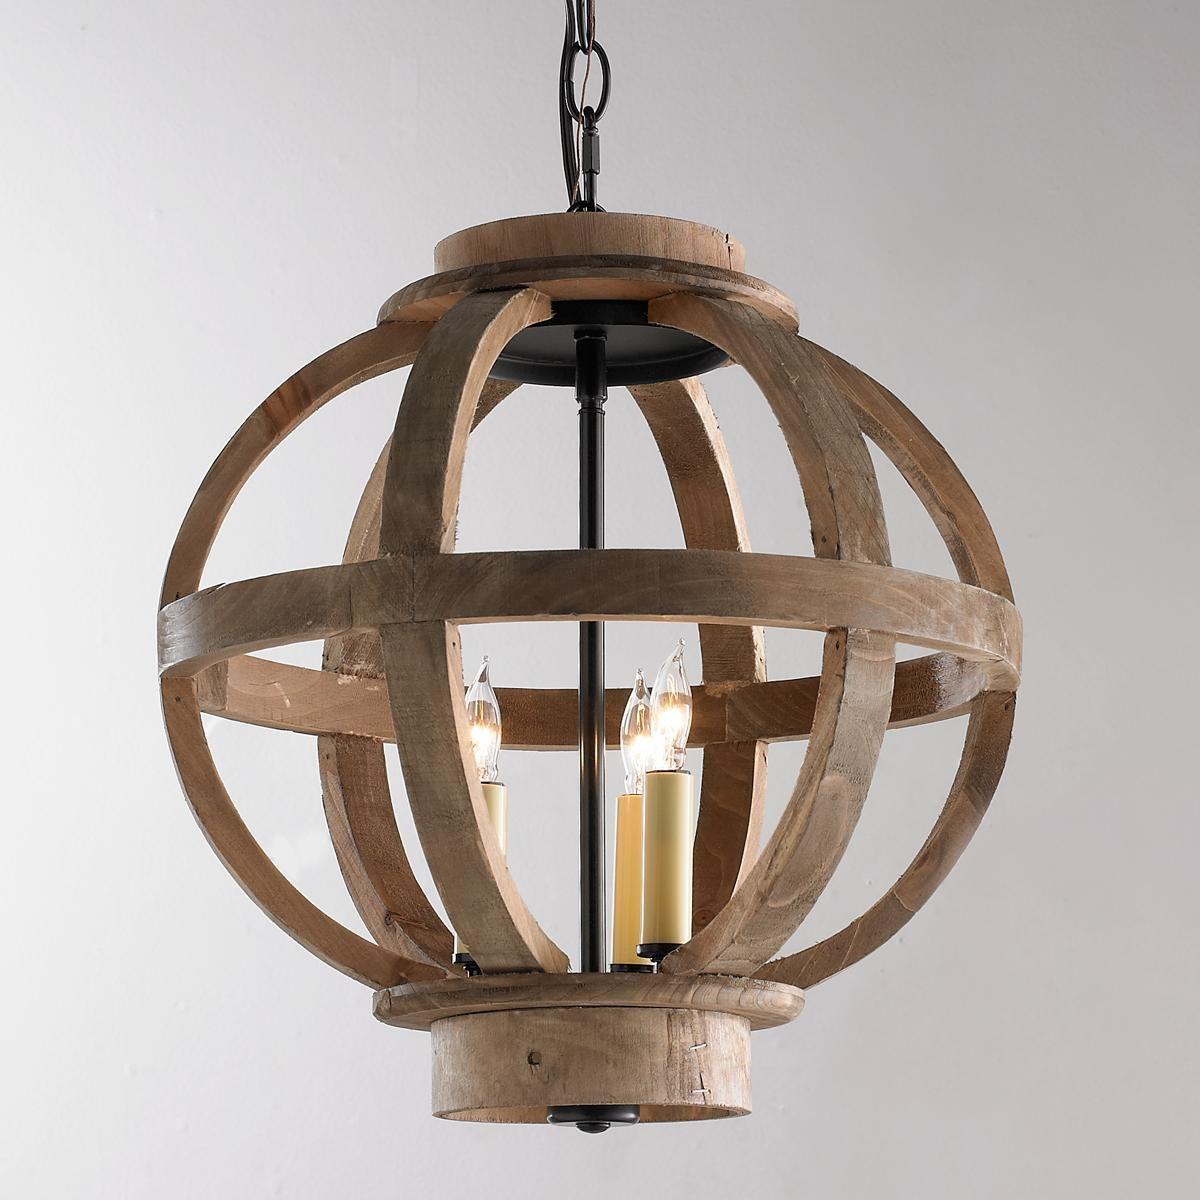 mini wood globe lantern foyer entrance way ideas wood pendant light lanterns chandelier. Black Bedroom Furniture Sets. Home Design Ideas